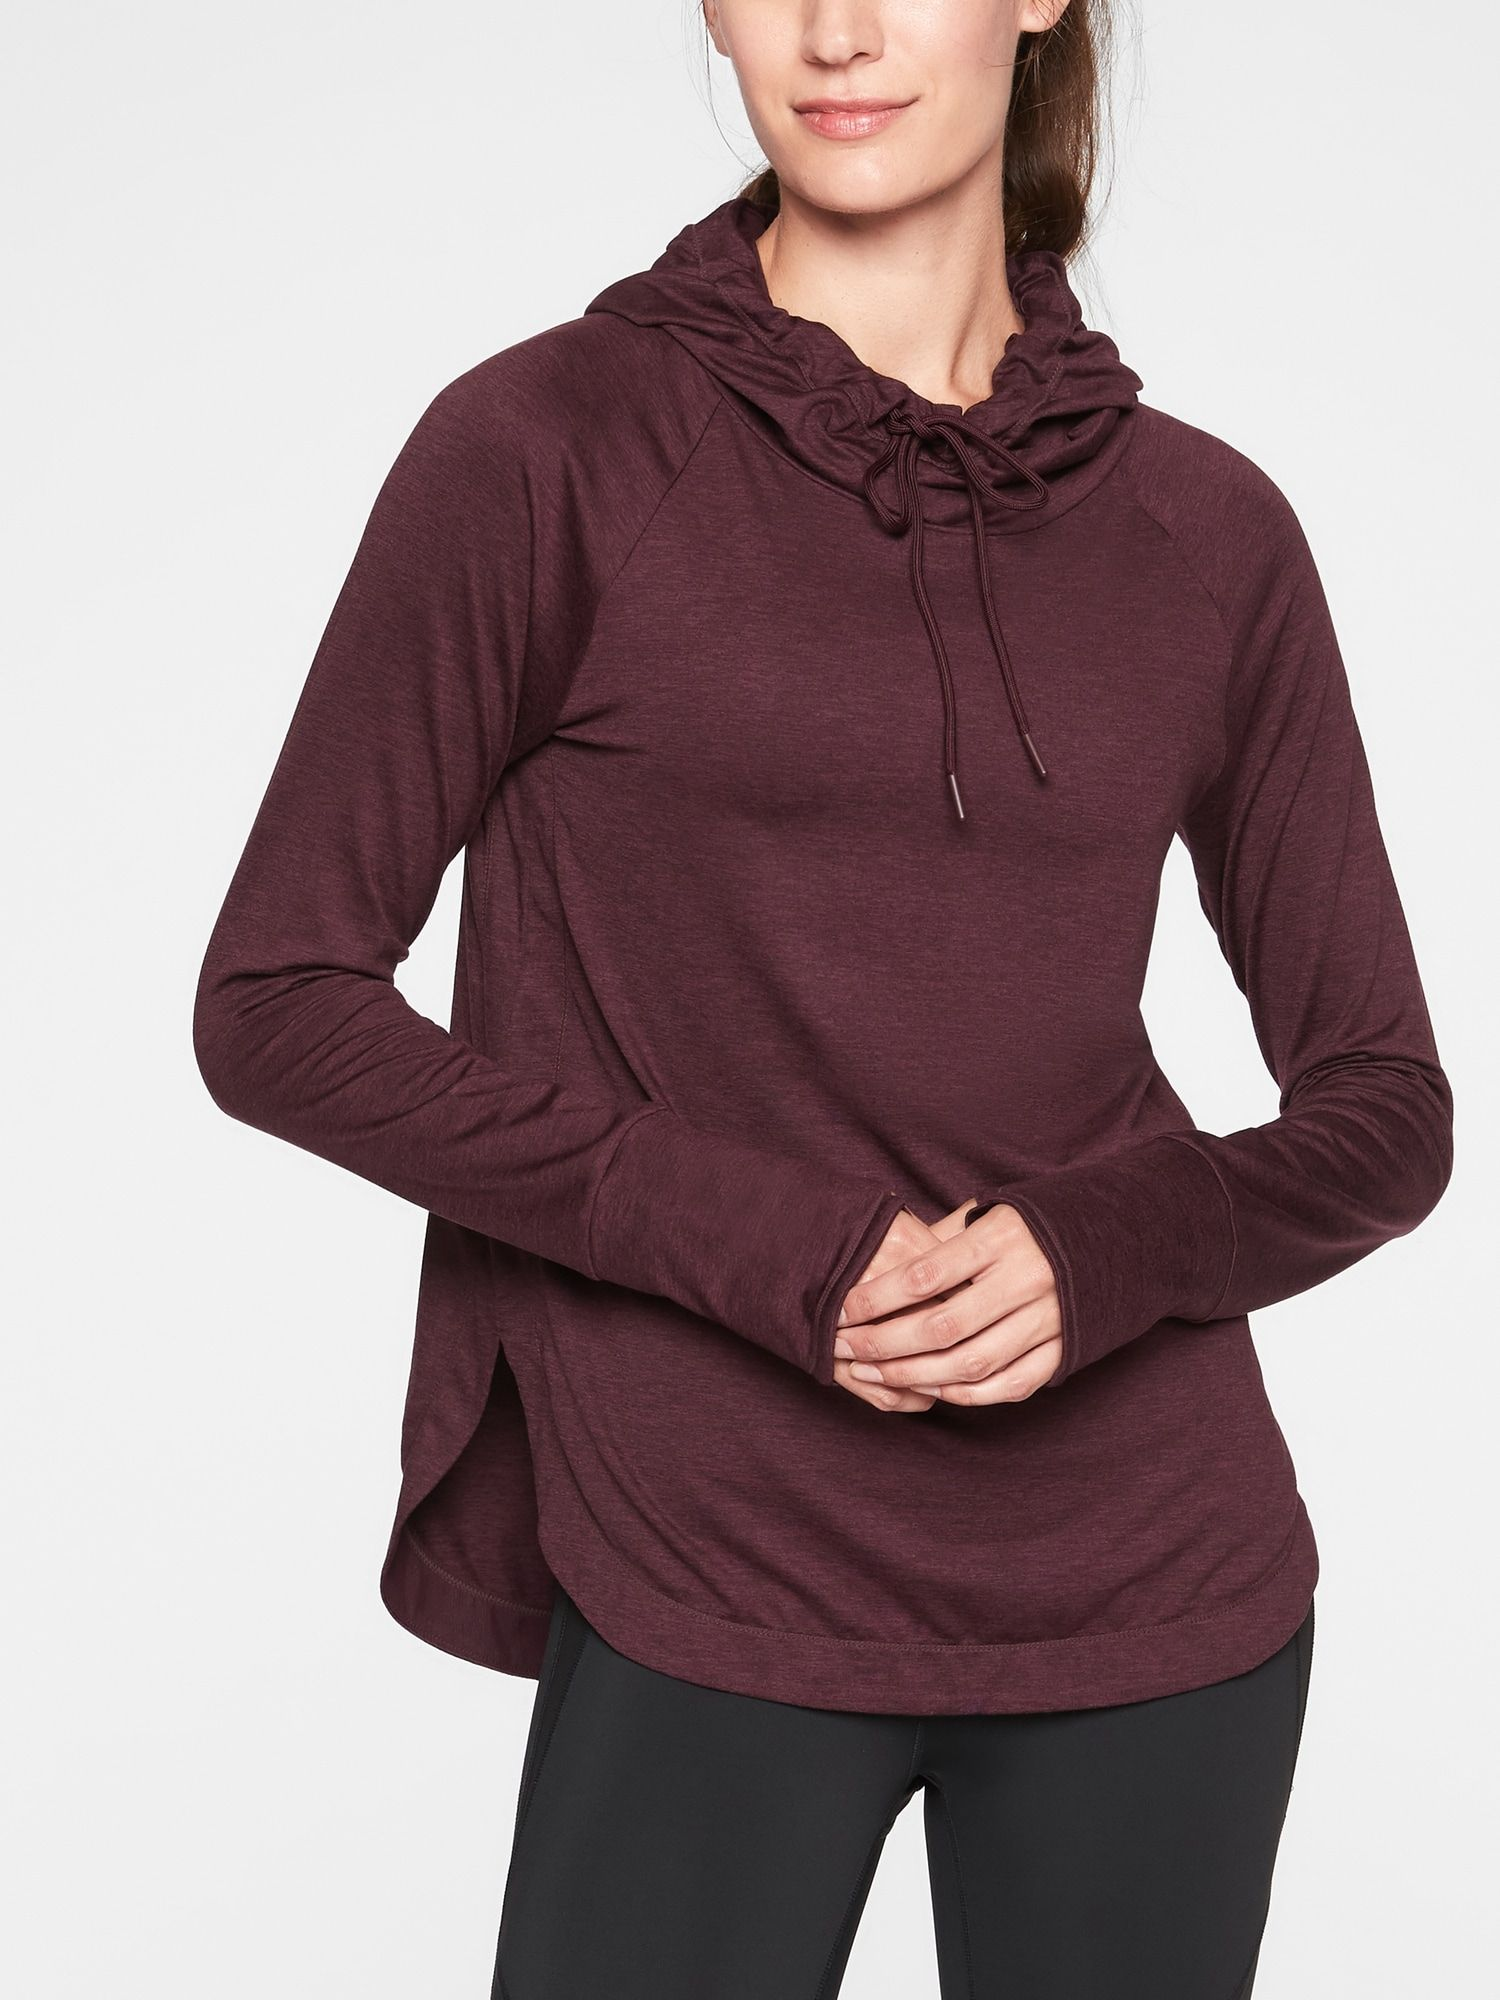 Uptempo Hoodie Sweatshirt Athleta Sweatshirts Hoodie Hoodies Workout Tops For Women [ 2000 x 1500 Pixel ]